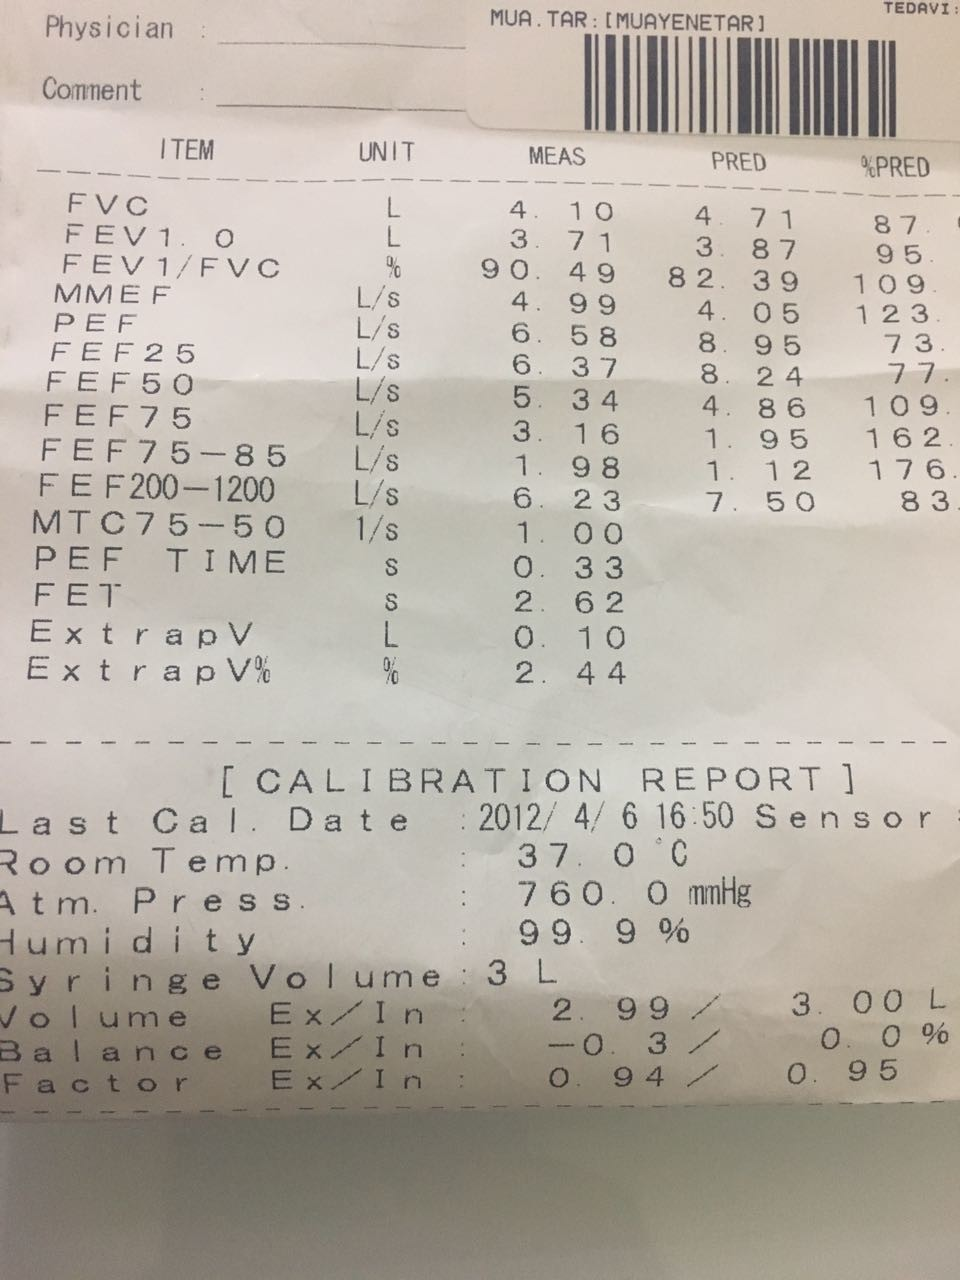 PQ87dQ - Solunum testine göre  hangi oranda rapor verilir?